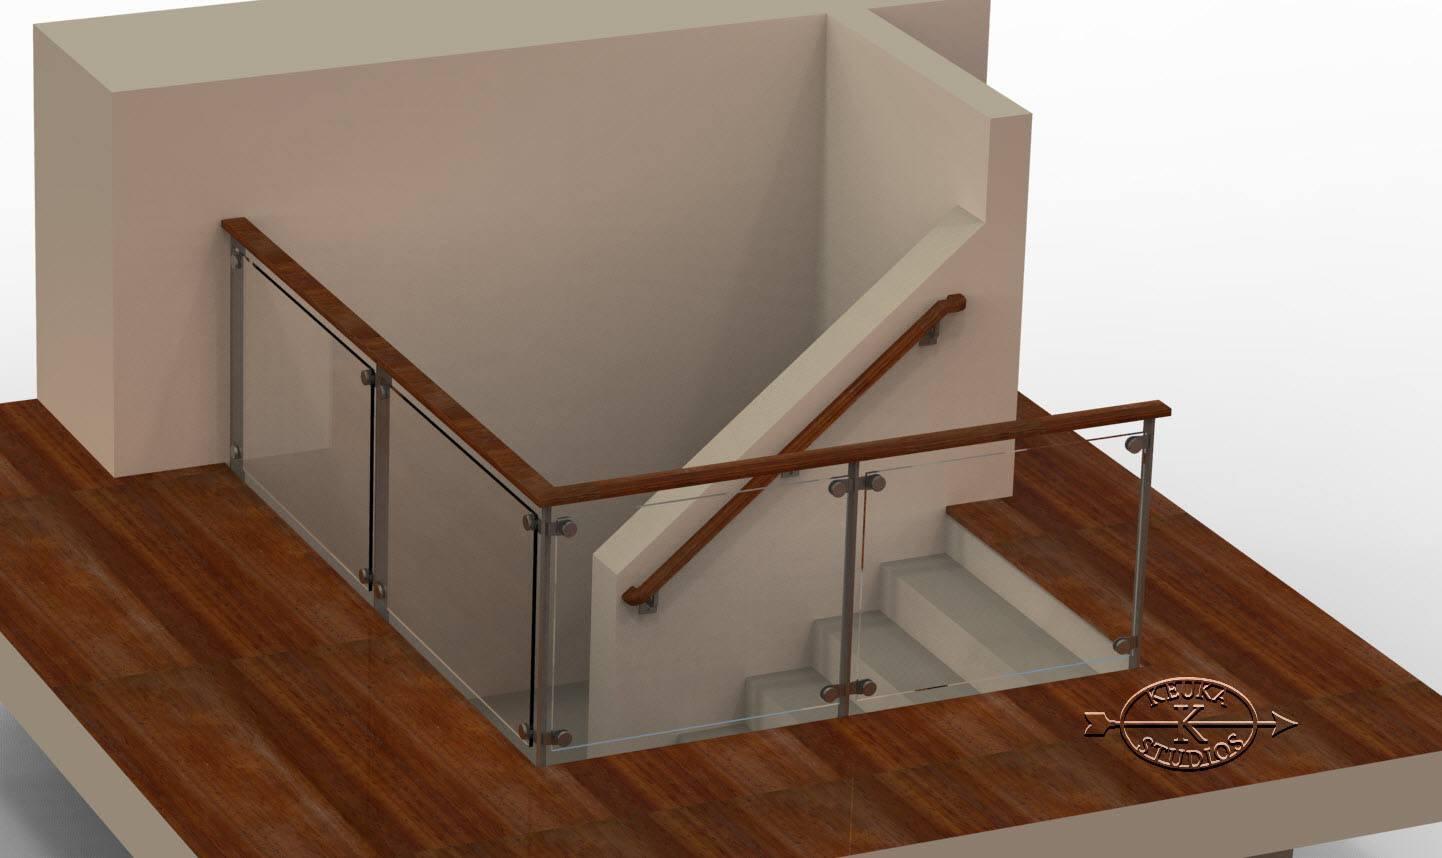 Glass railing rendering